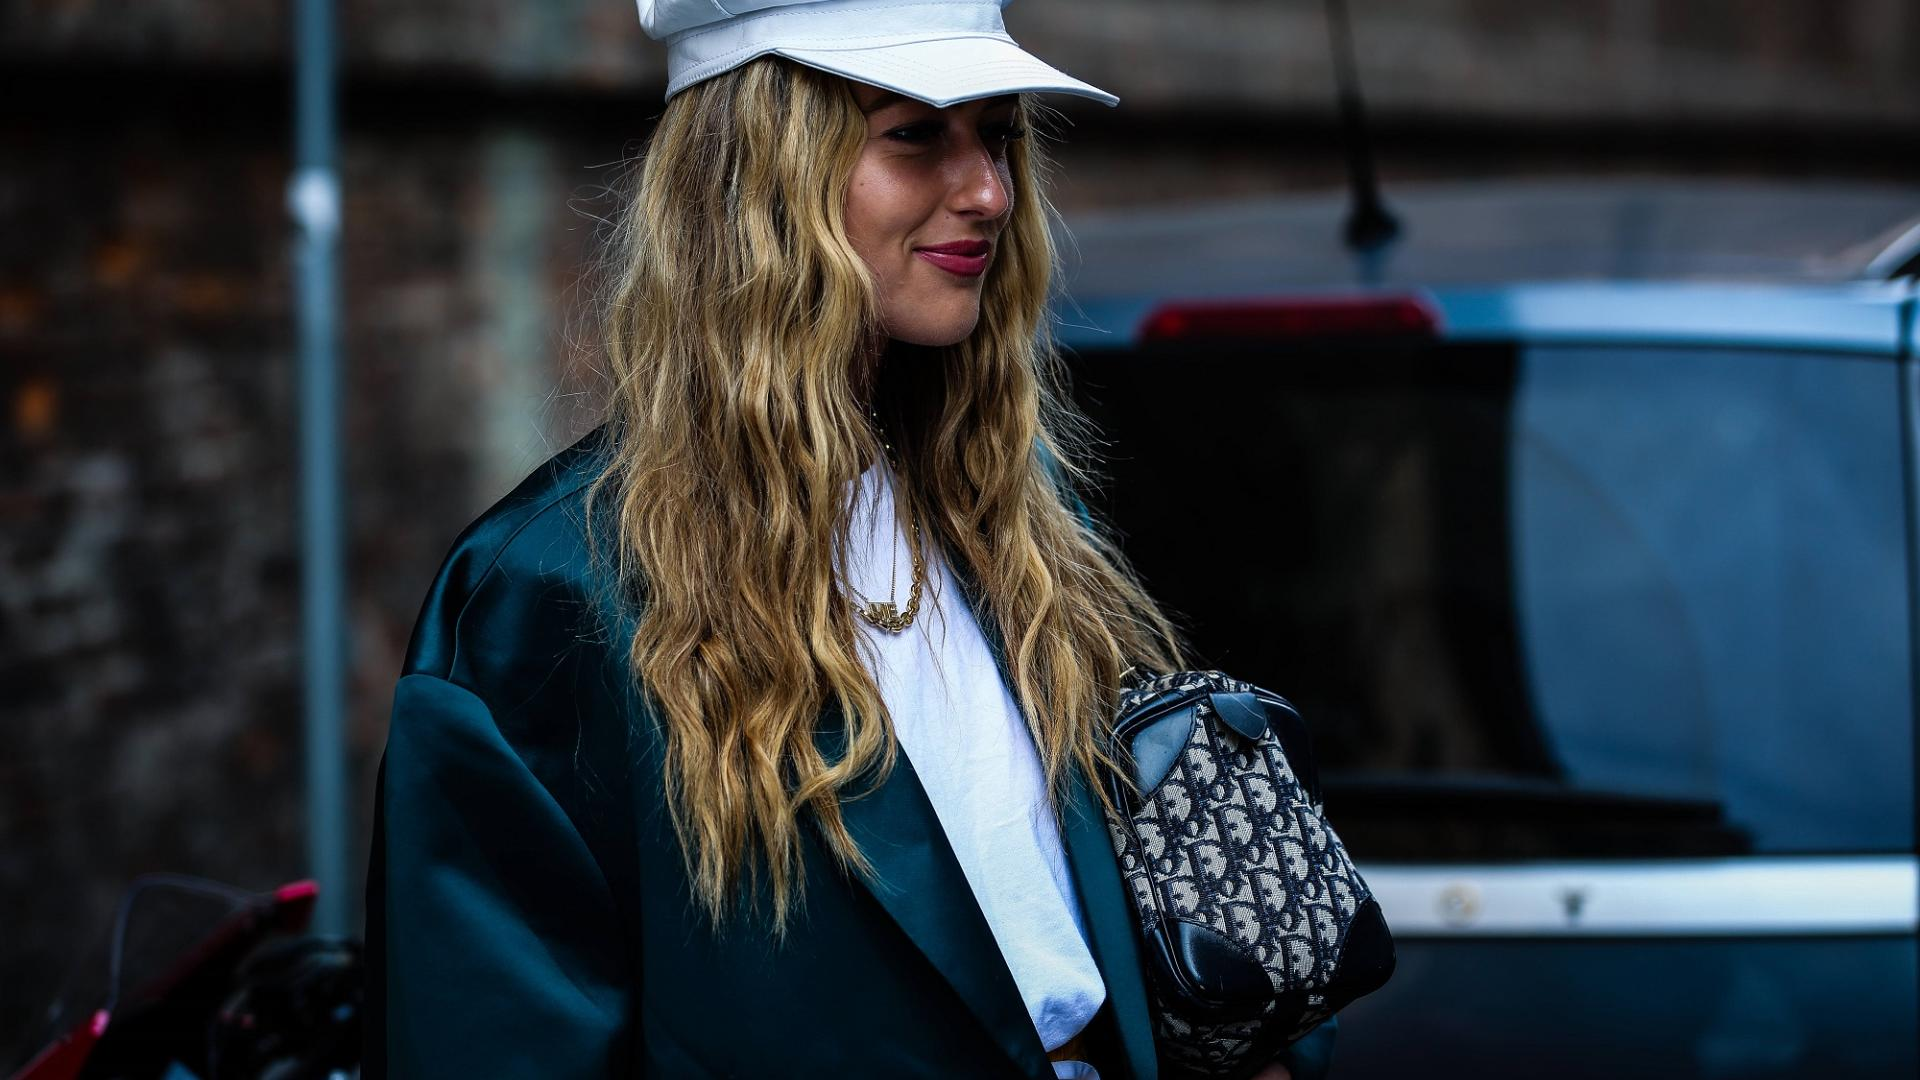 Skandinavische Mode, Emili Sindlev